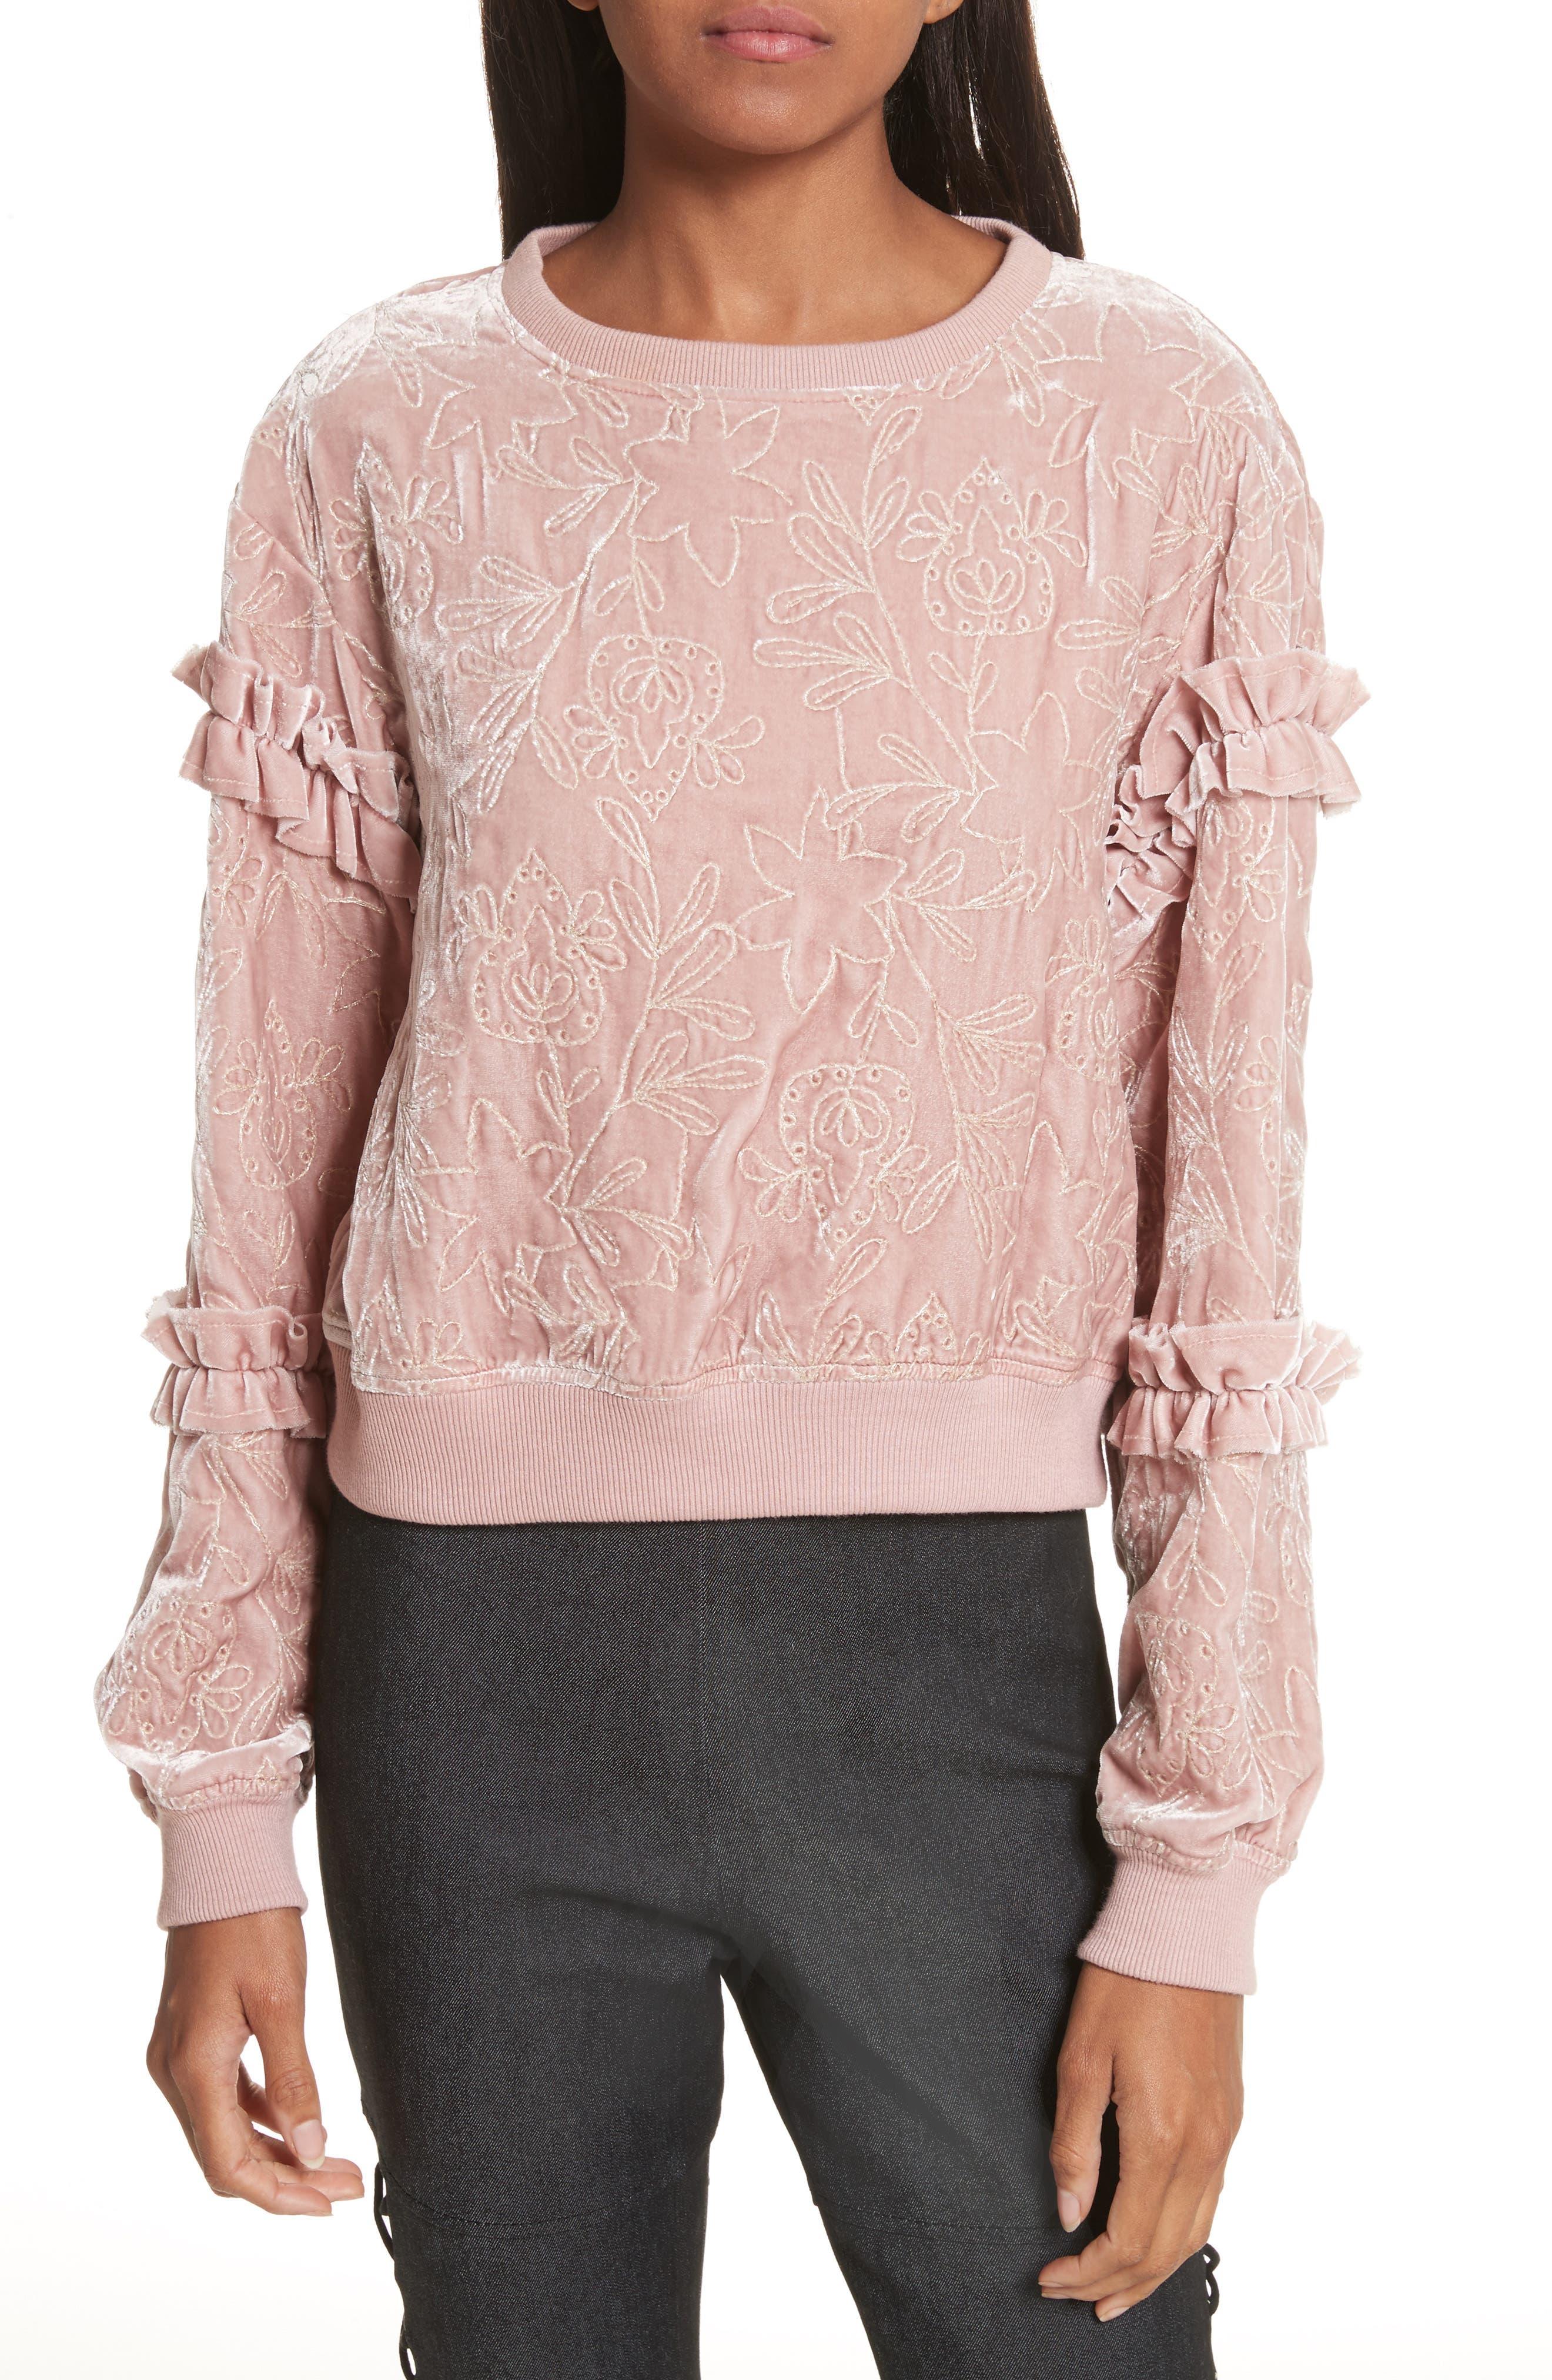 Nara Embroidered Velvet Sweatshirt,                         Main,                         color, 563